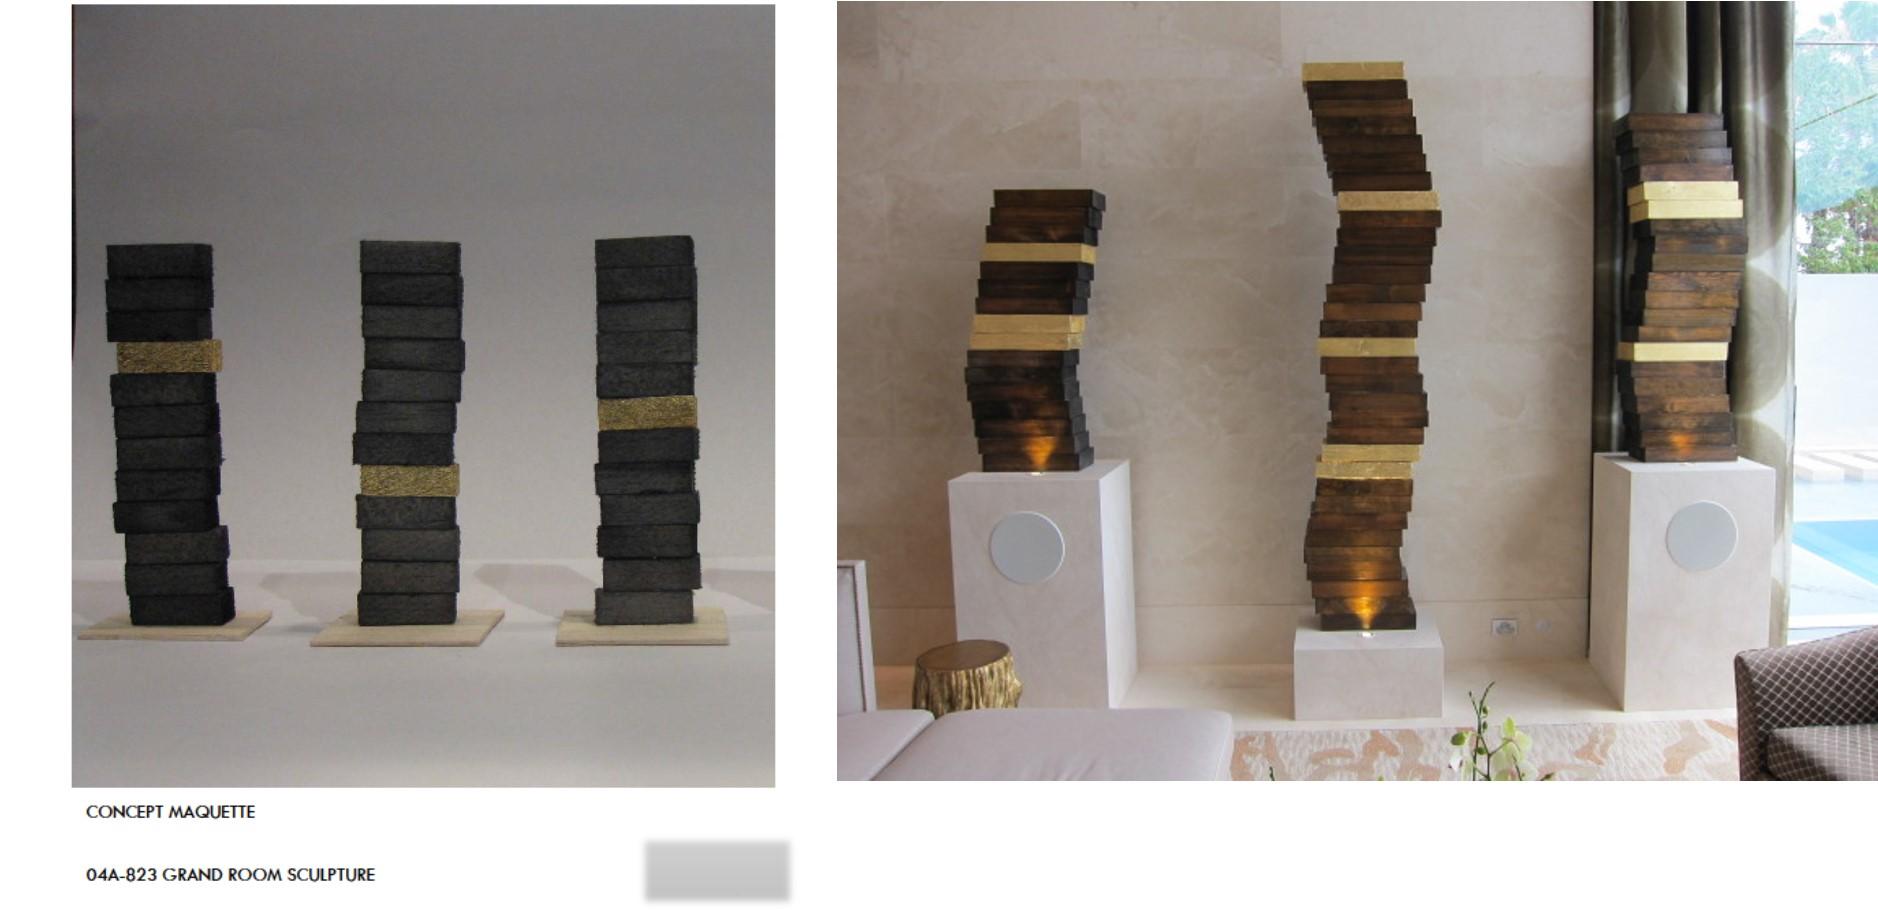 maquette vs built.jpg